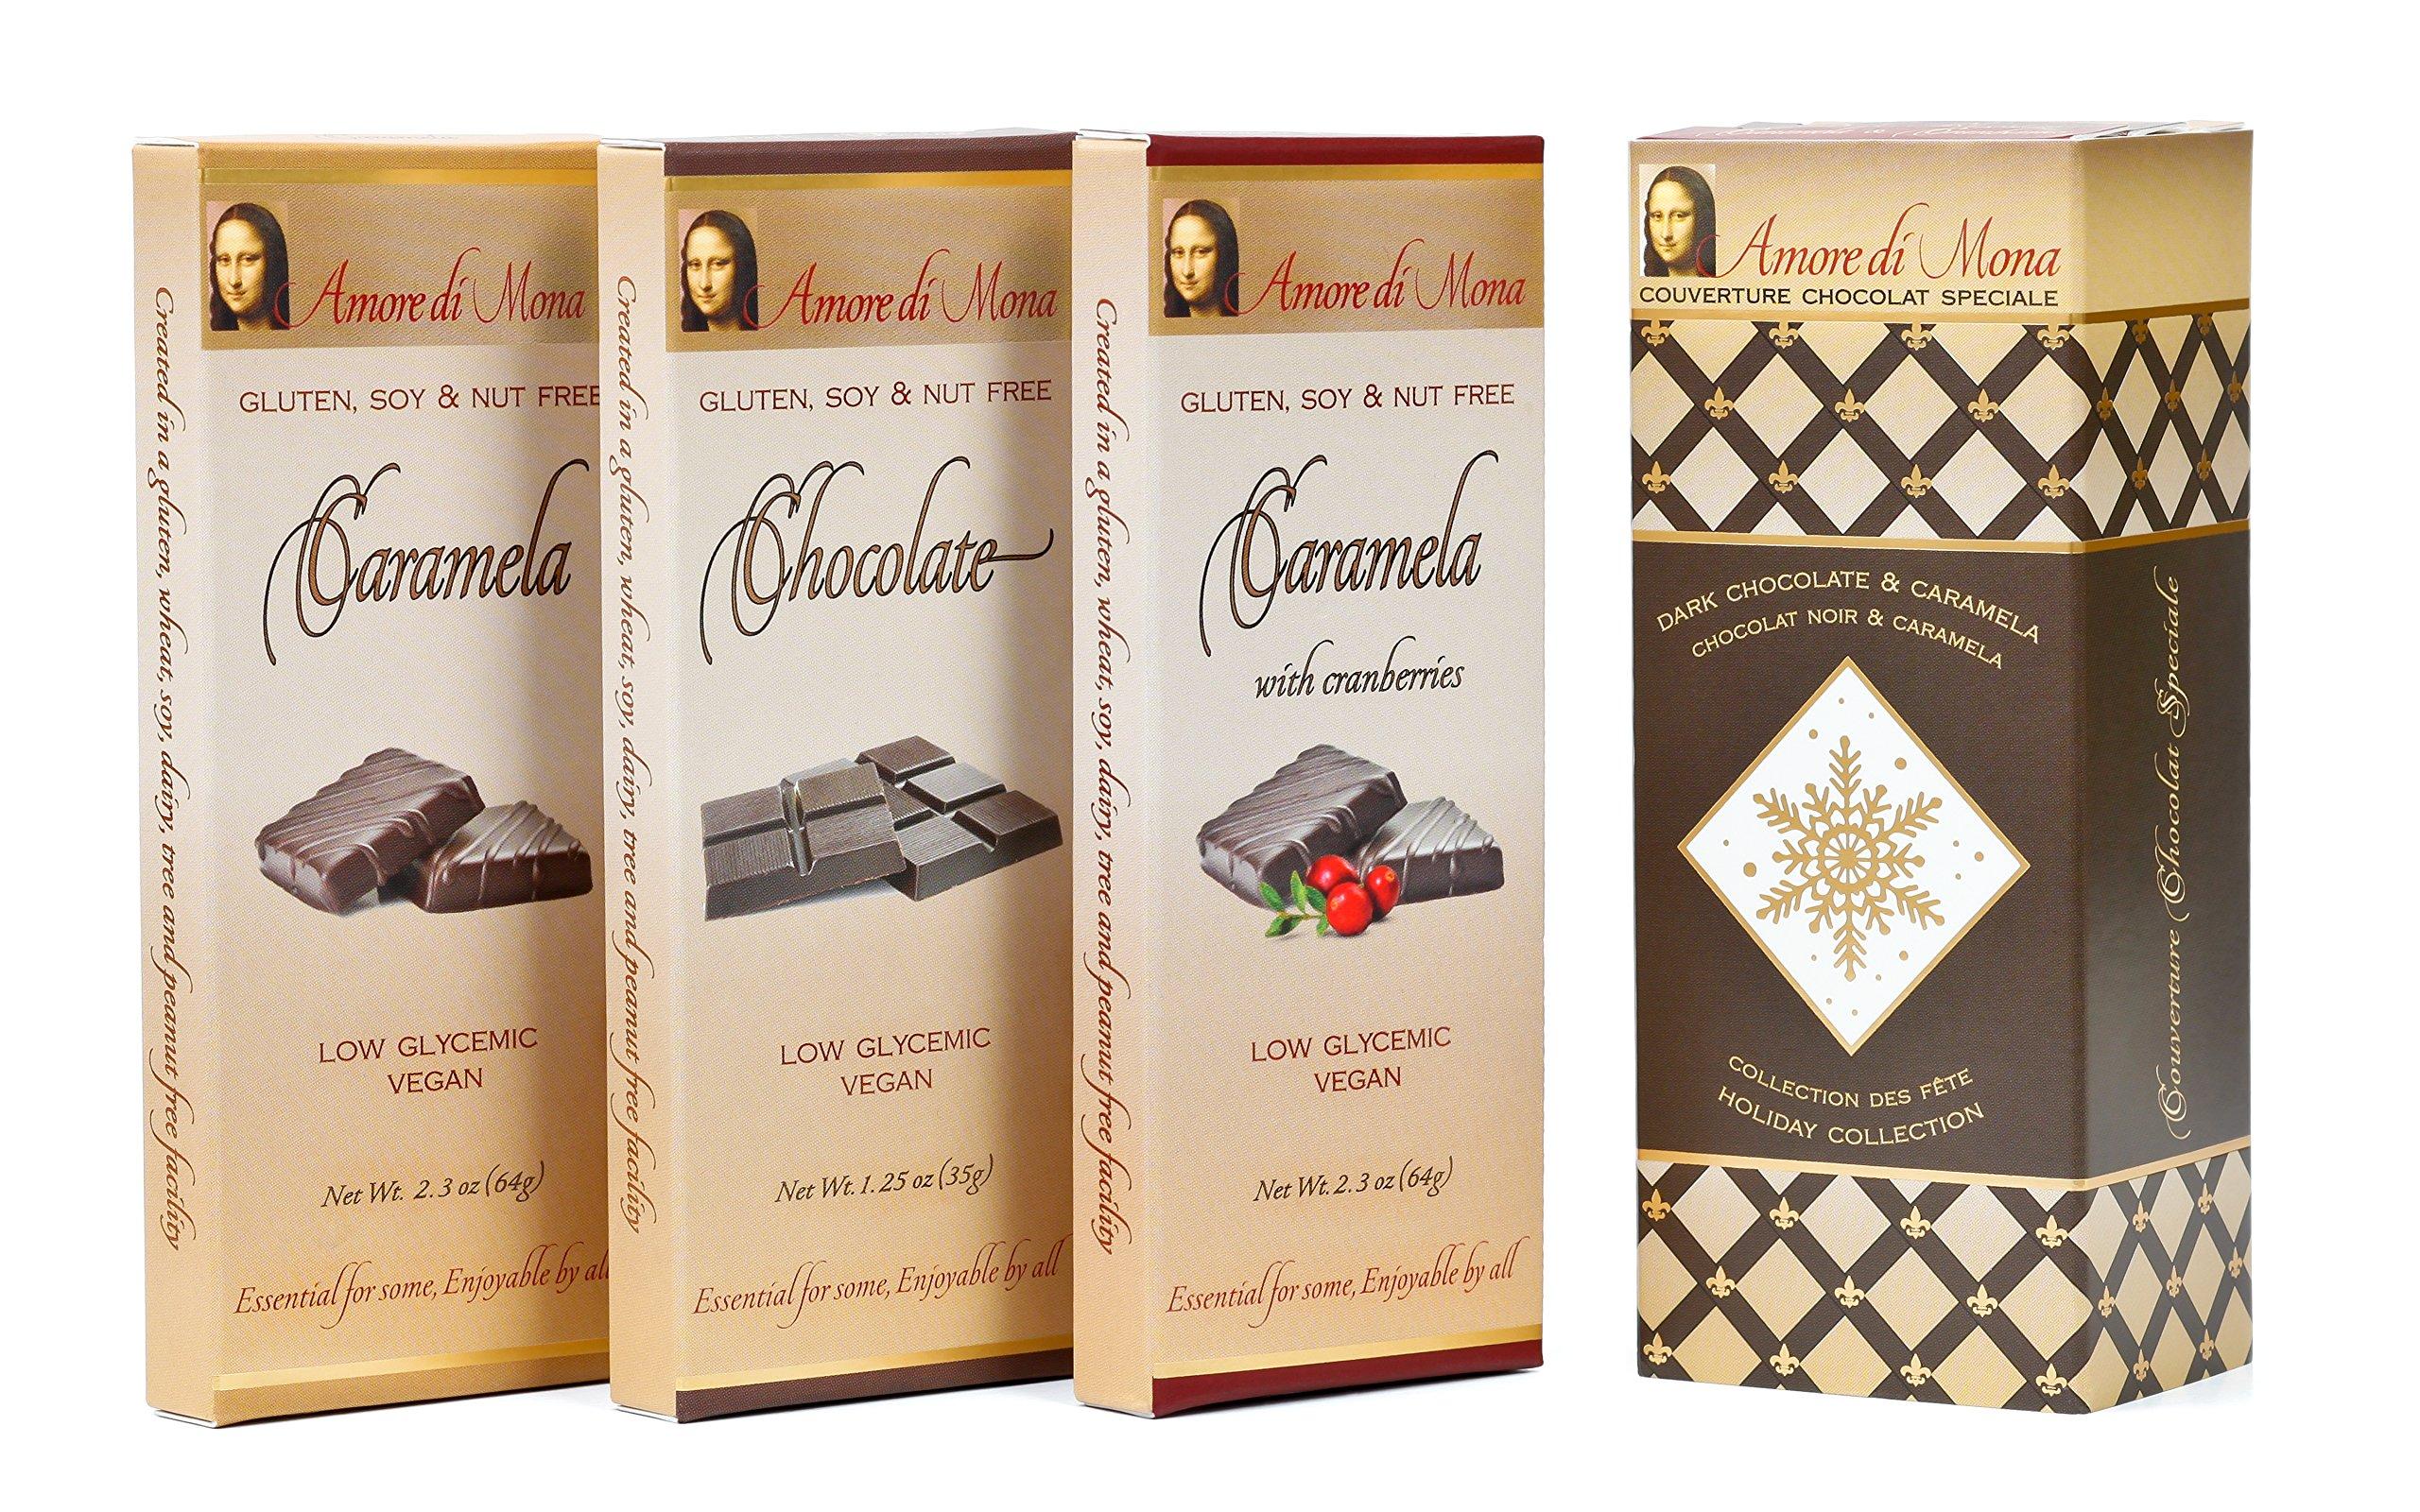 Amore di Mona Artisanal Vegan Chocolate Gift - Holiday 3 Pack: Chocolate, Caramela, Cranberry Caramela. Premium Ingredients are All Natural, Non-GMO, Kosher. Gluten, Soy, Sesame, Milk, Nut Free